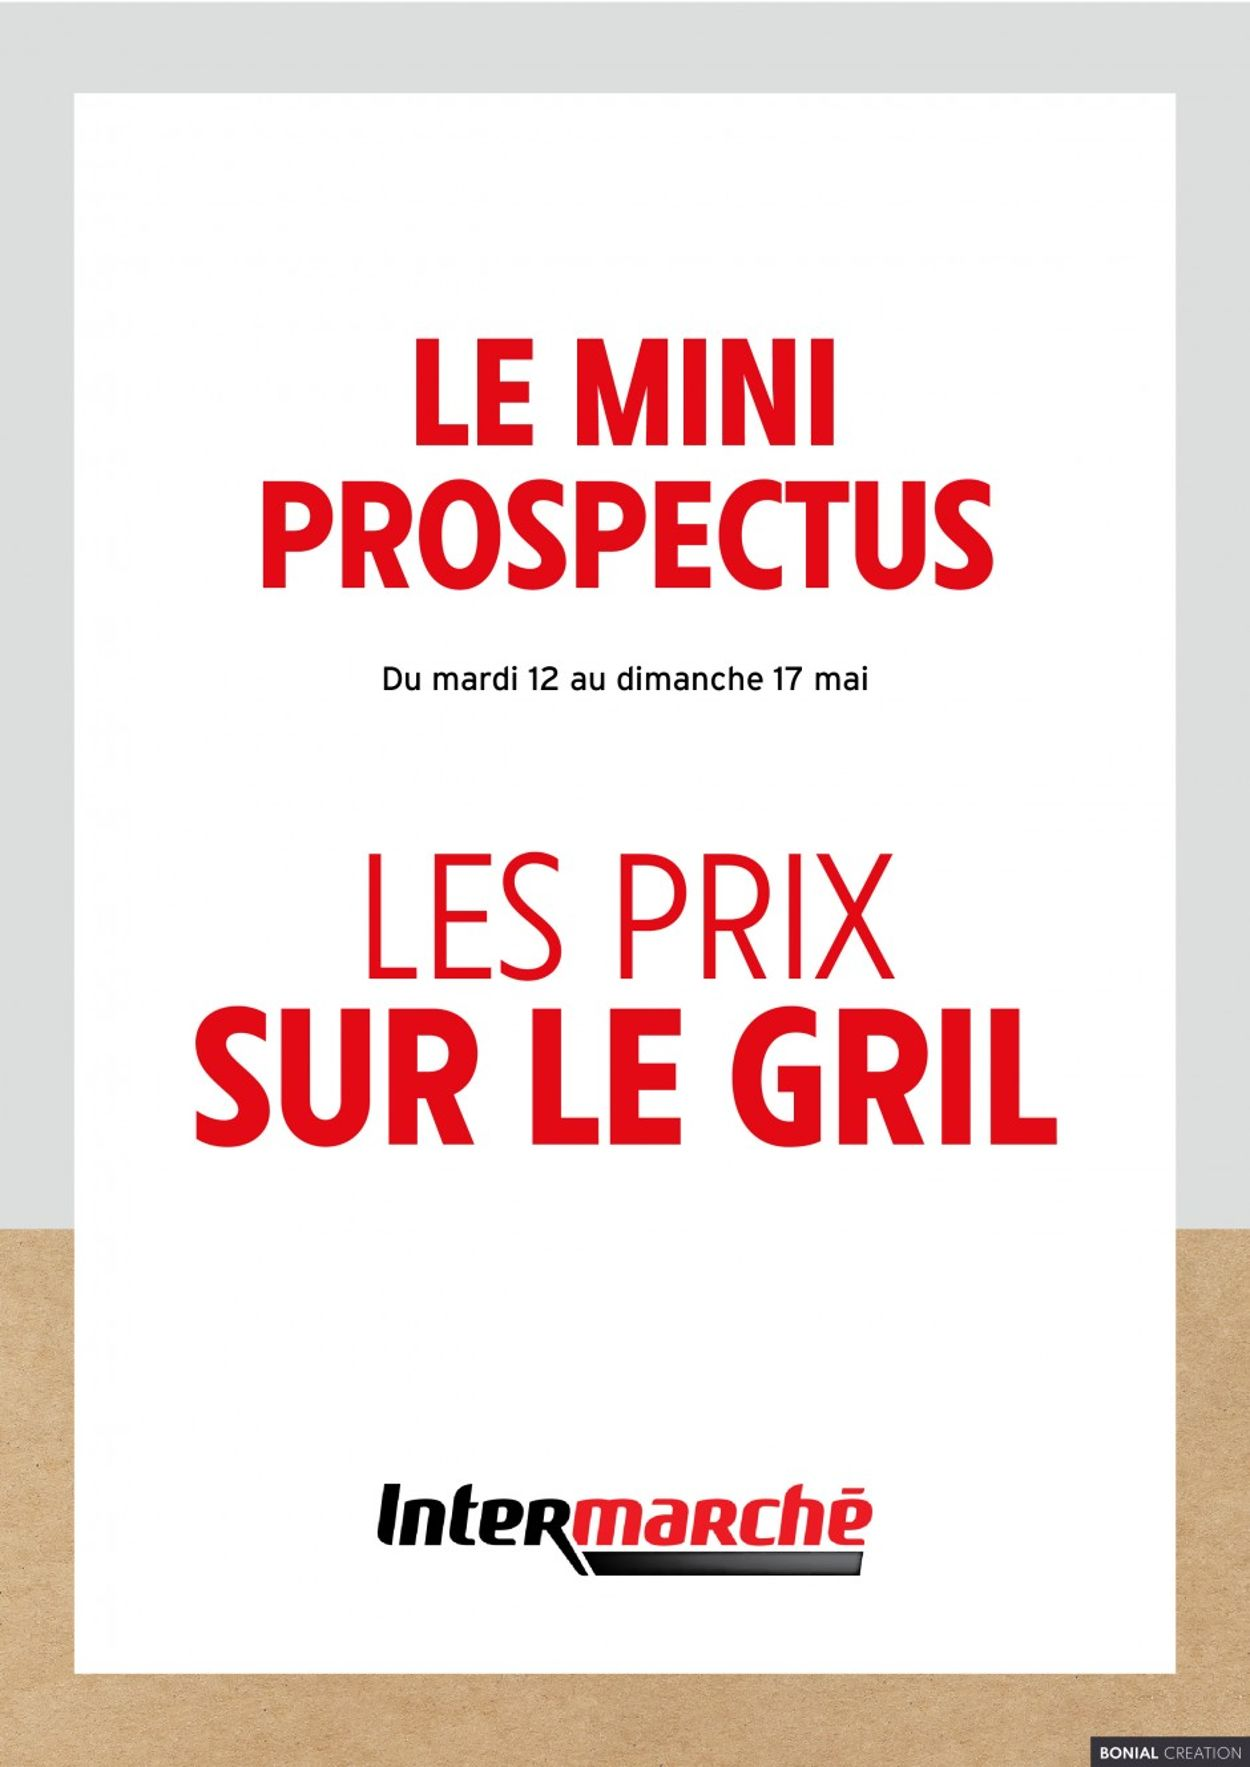 Intermarché Catalogue - 12.05-17.05.2020